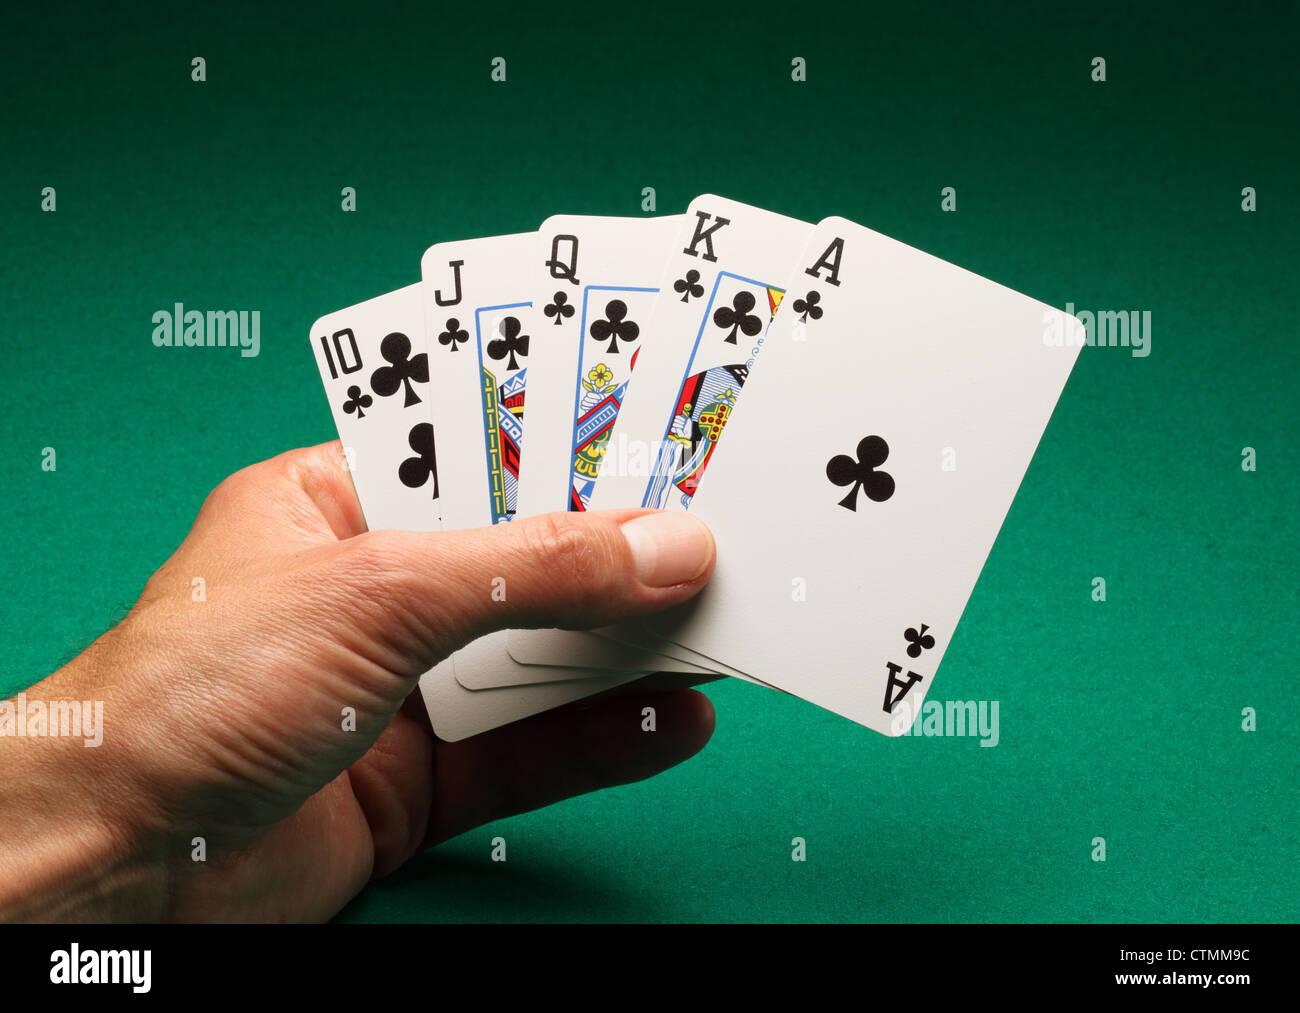 Free spins card registration